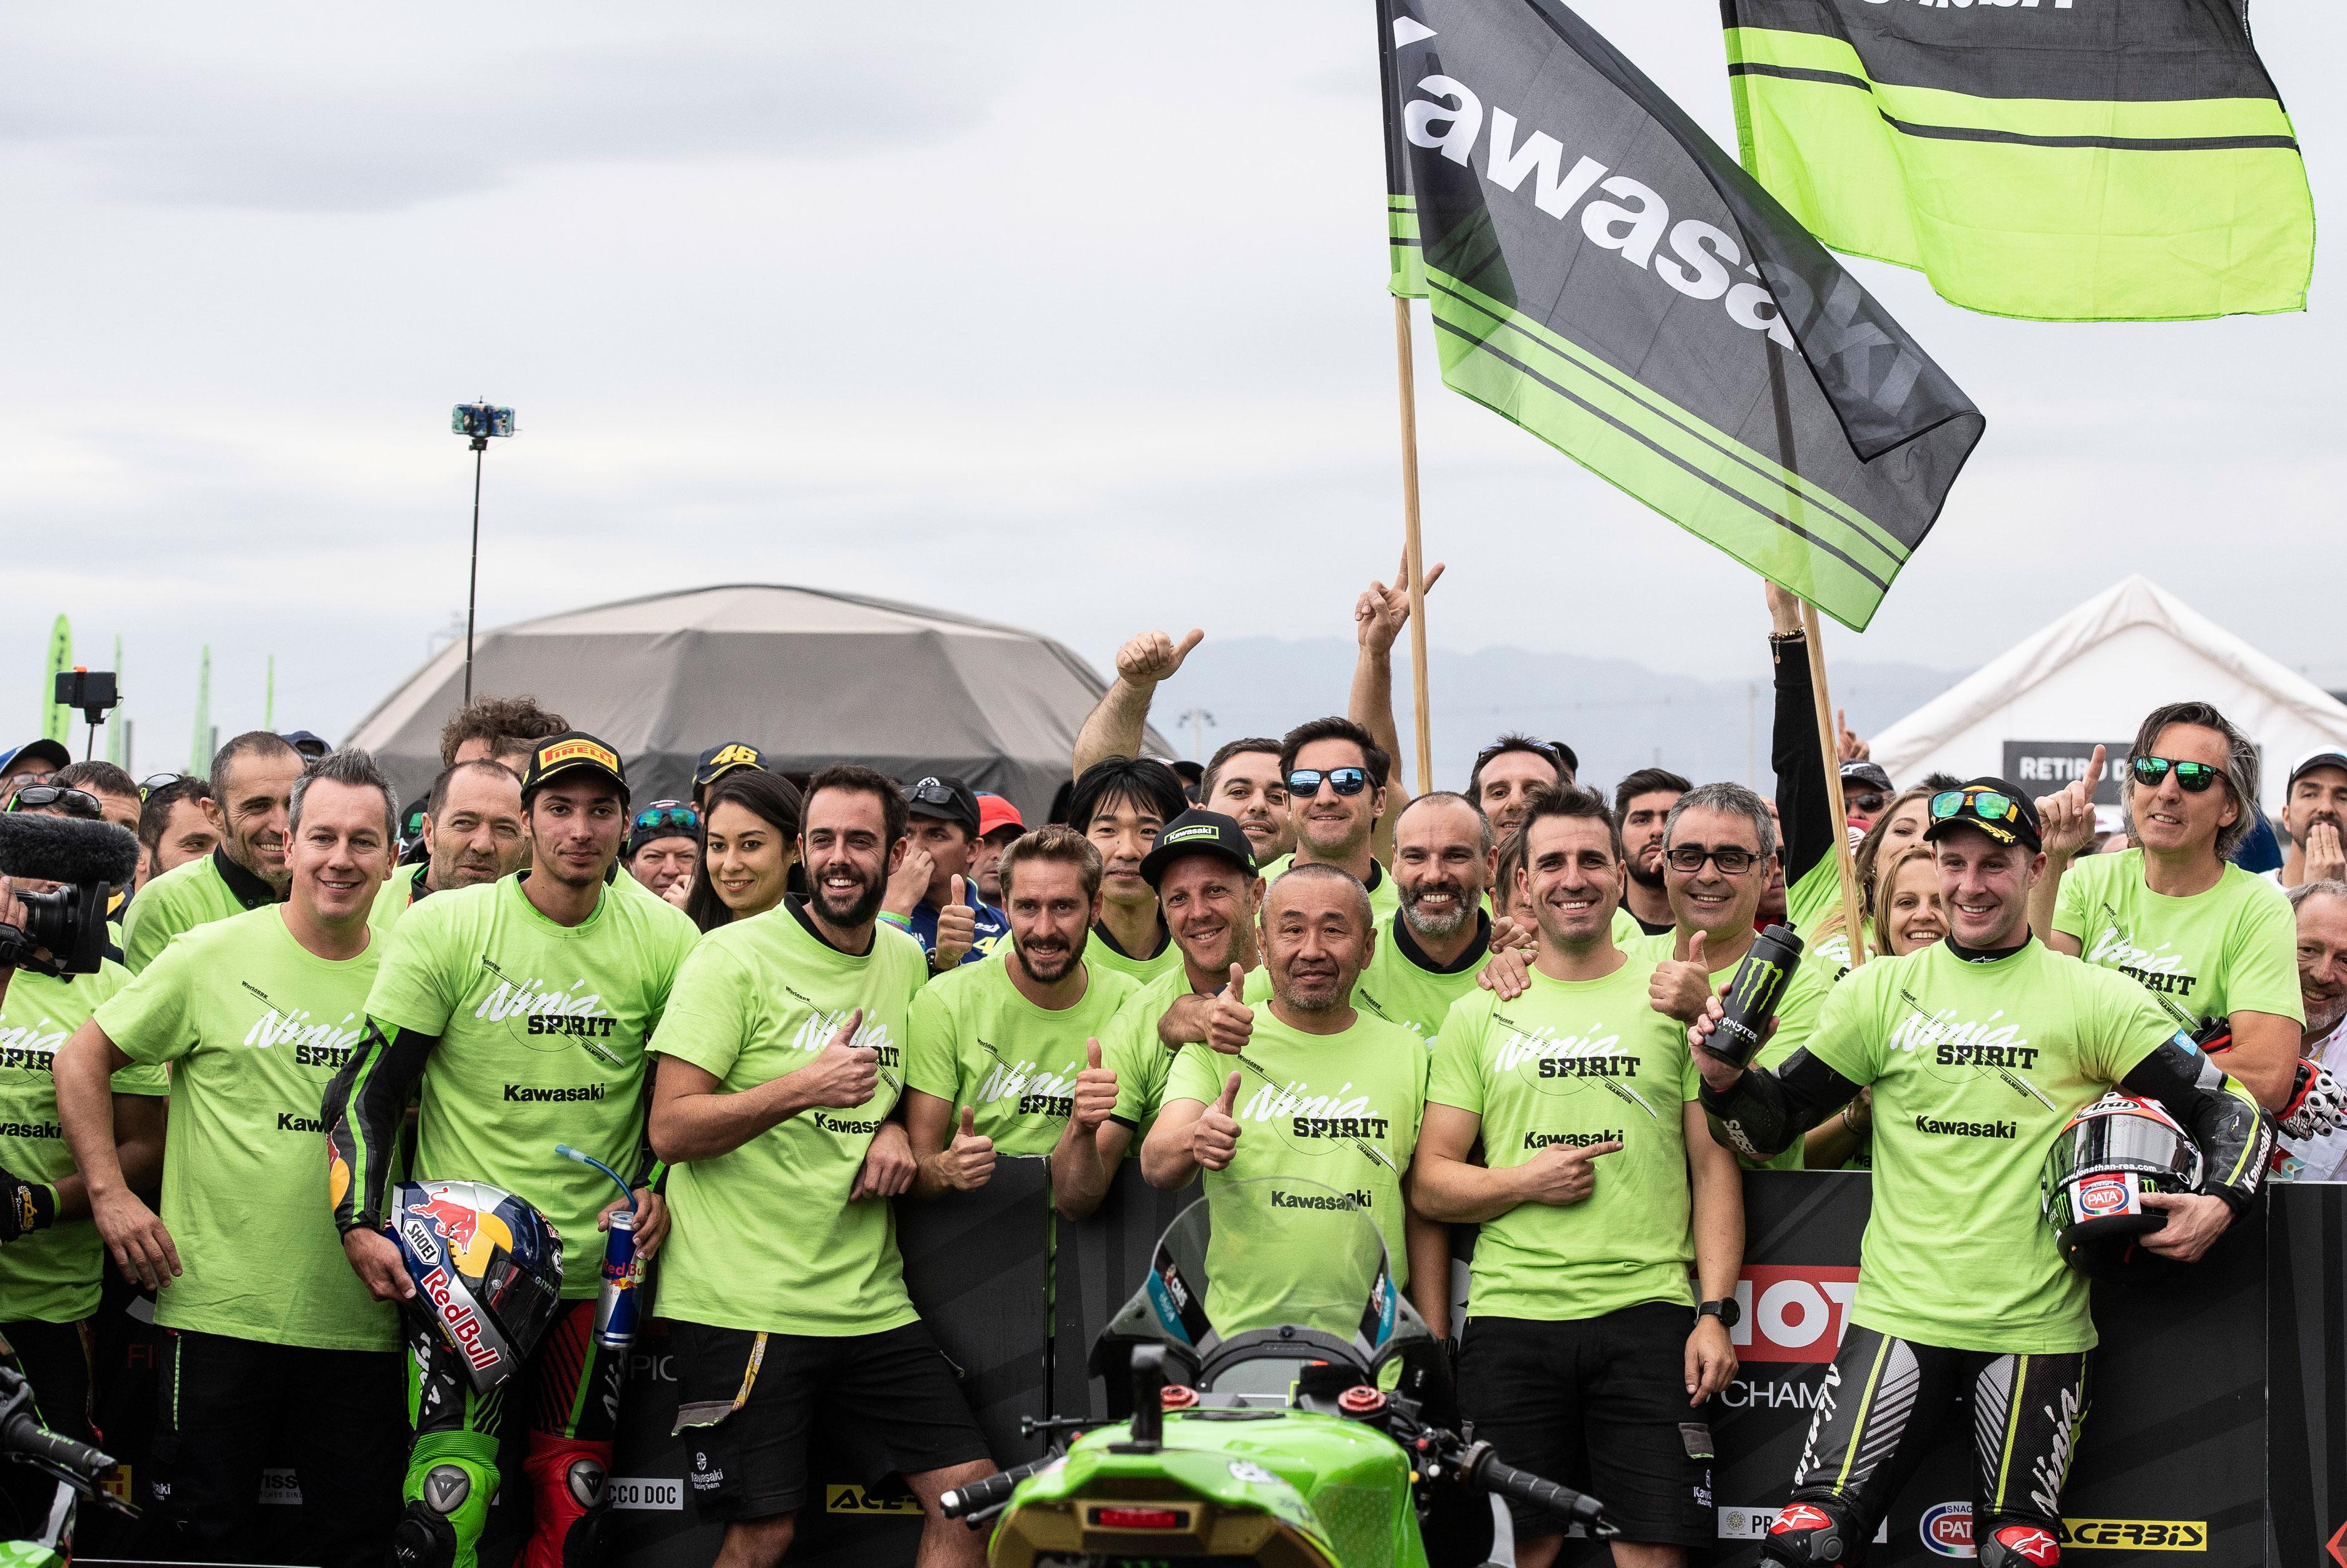 Kawasaki šampion